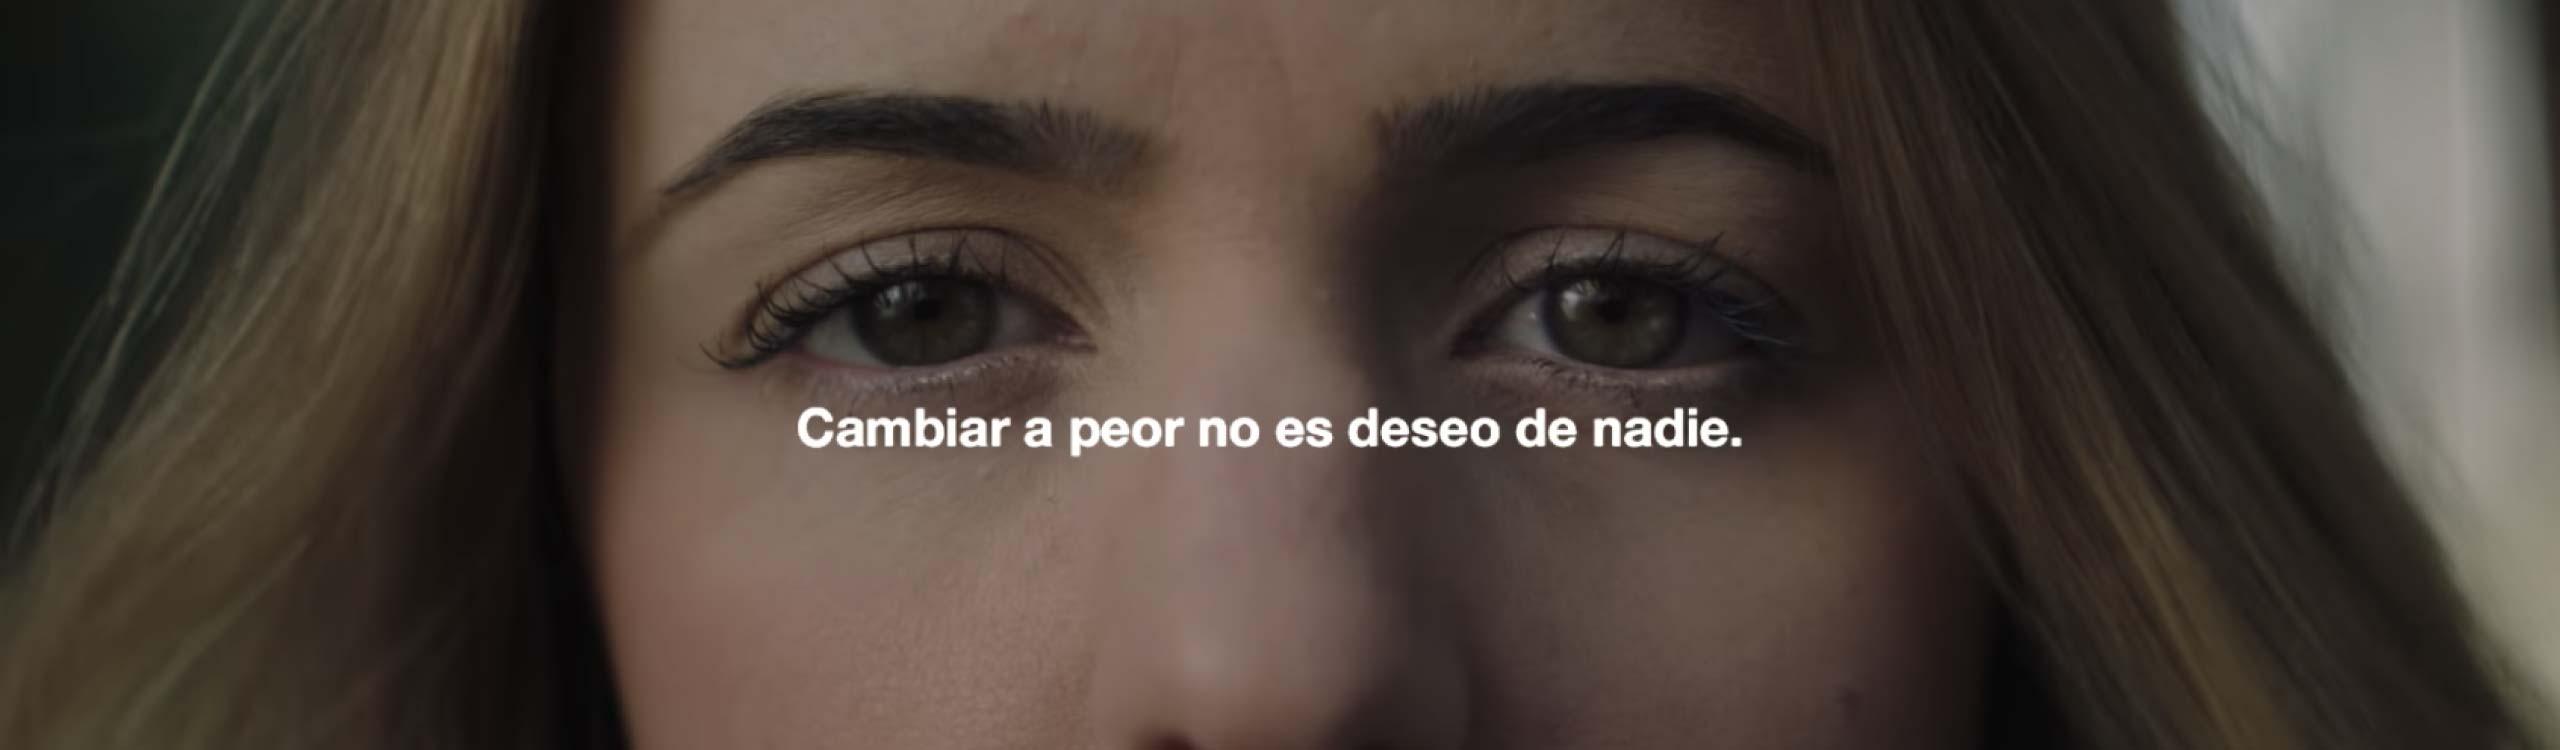 greenpeace espana deseos 2018 mis gafas de pasta destacado